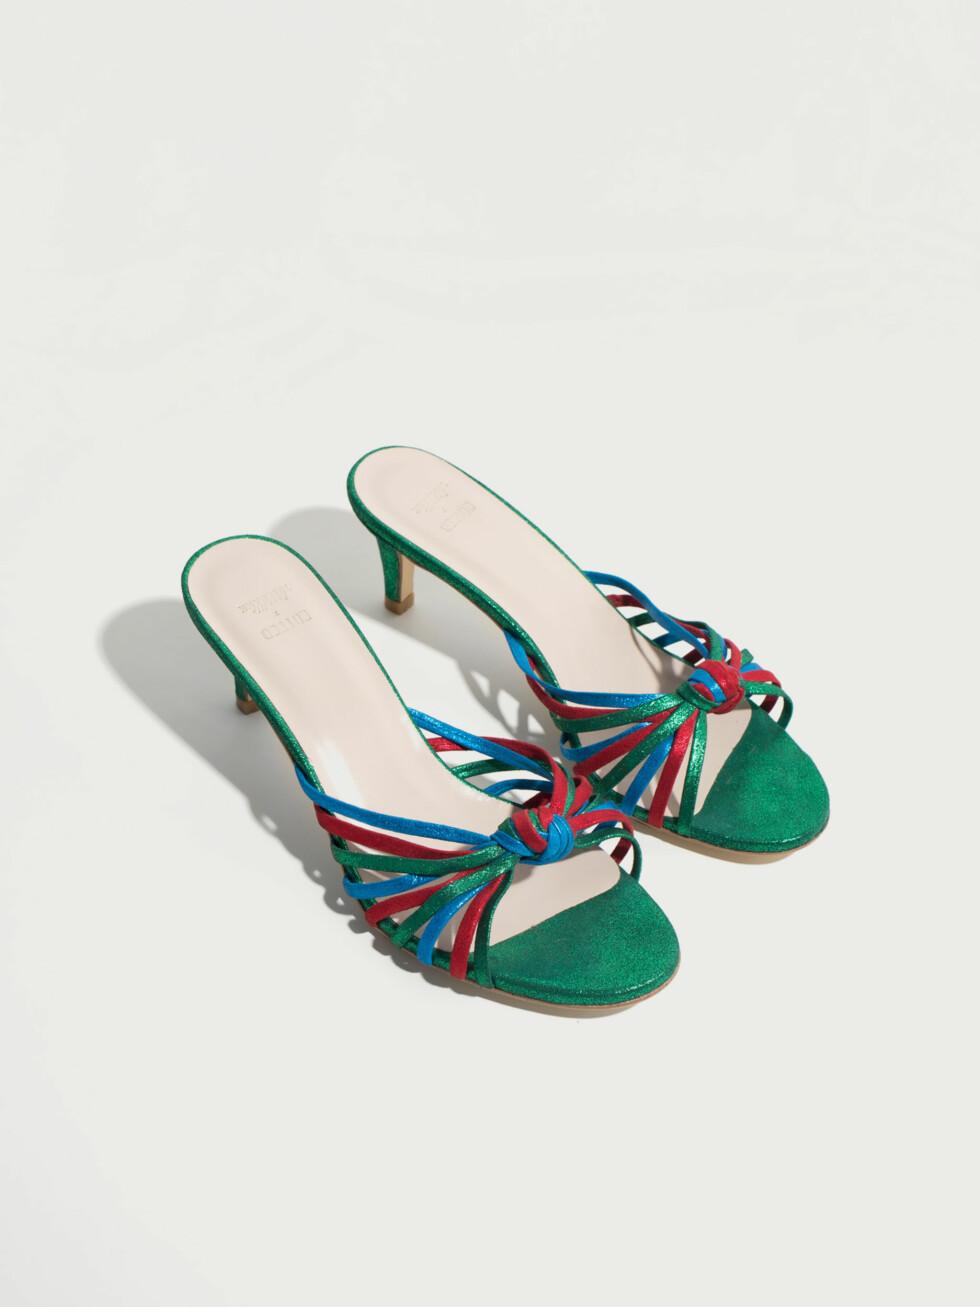 Kitten heels fra Edited |1128,-| https://www.edited.de/product/Kitten-Heels-Pernille-3920185